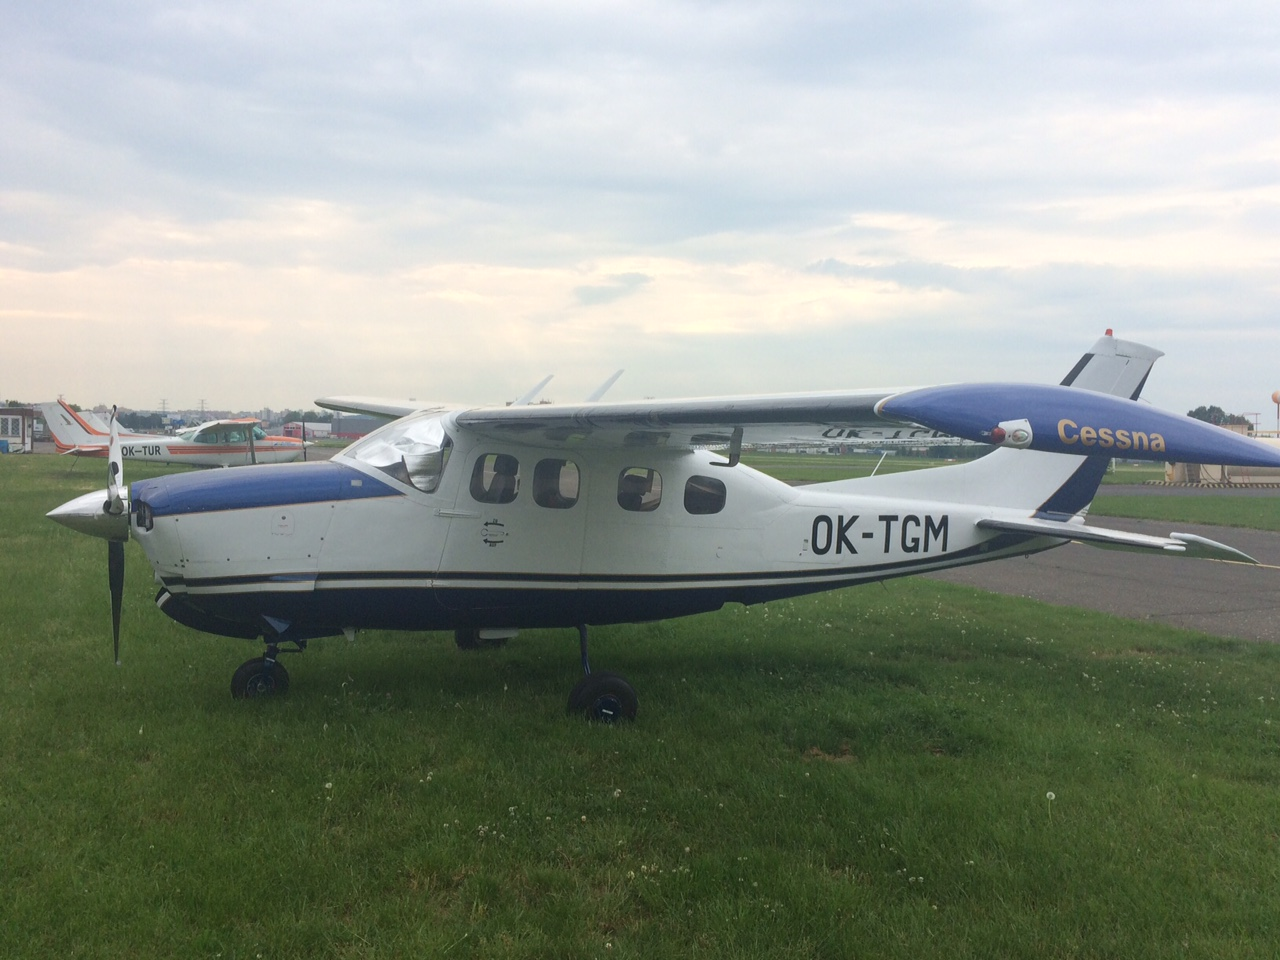 Cessna P210 N